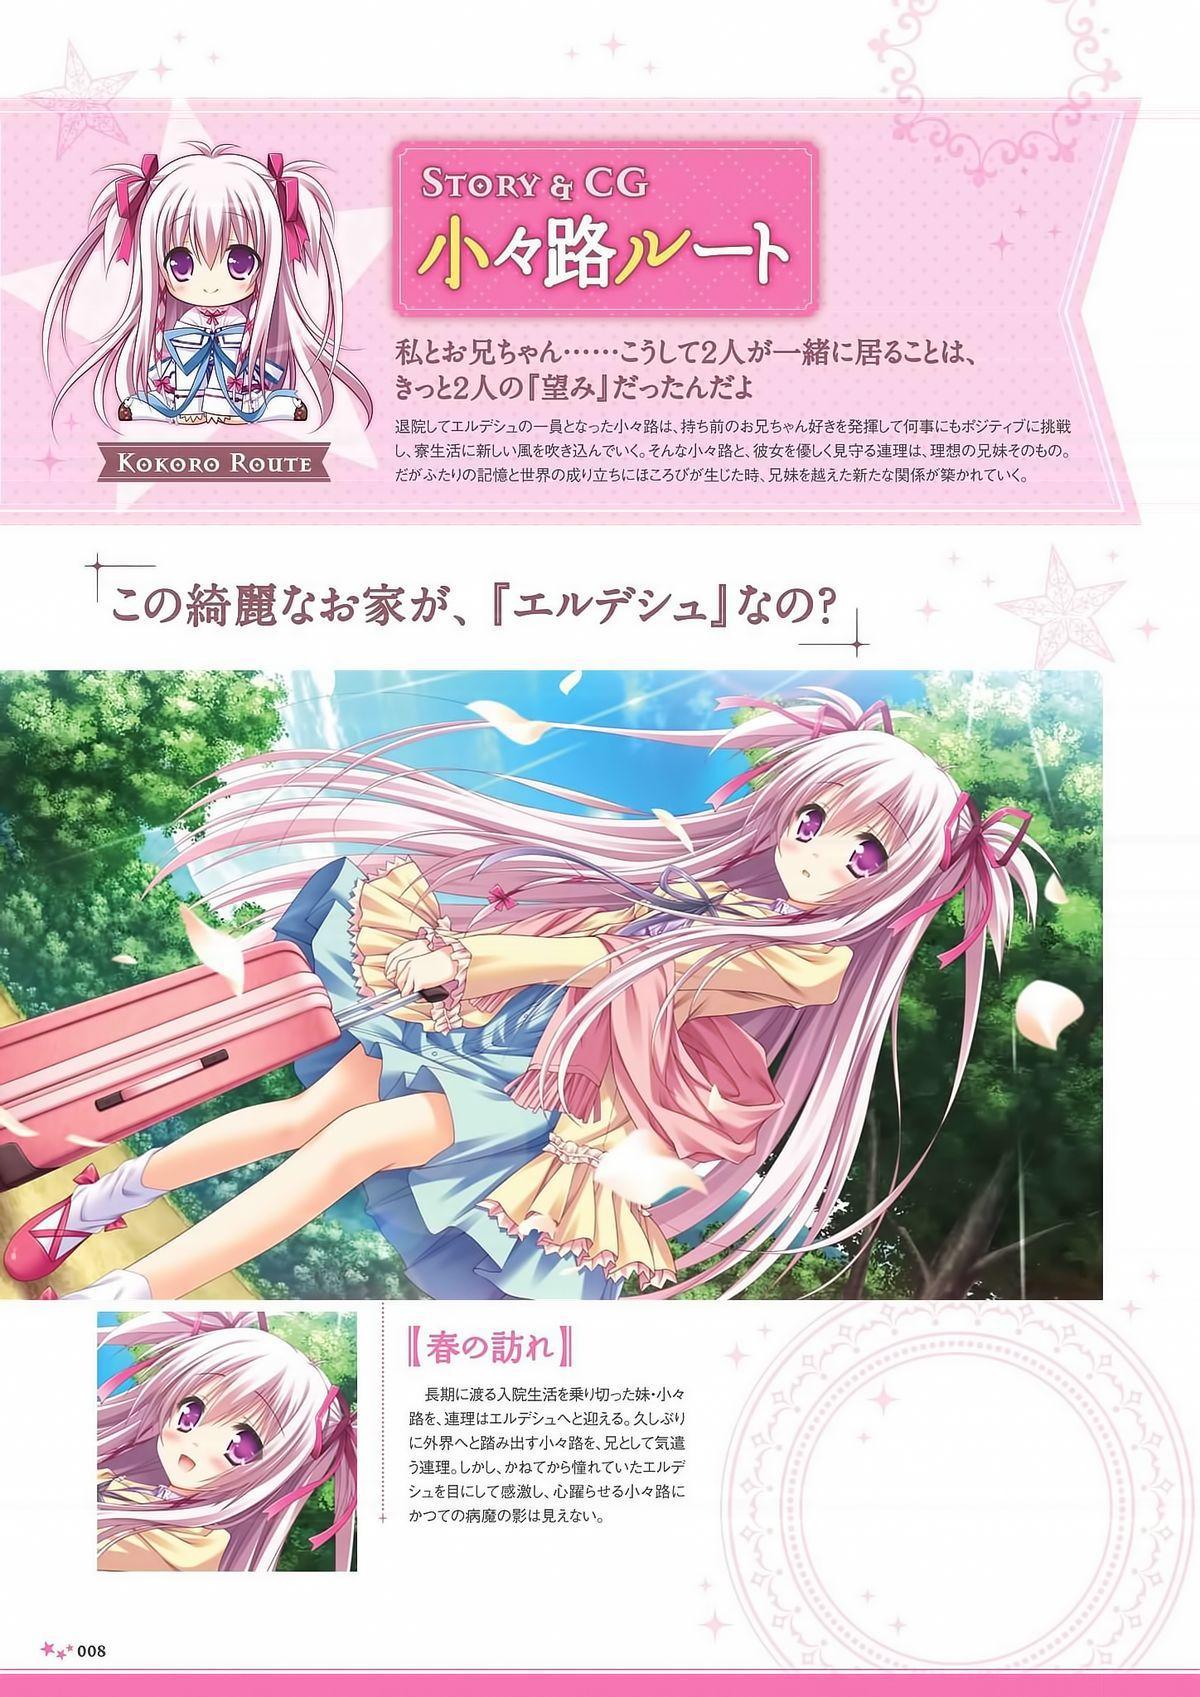 Sekai to Sekai no Mannaka de Visual Fanbook 9